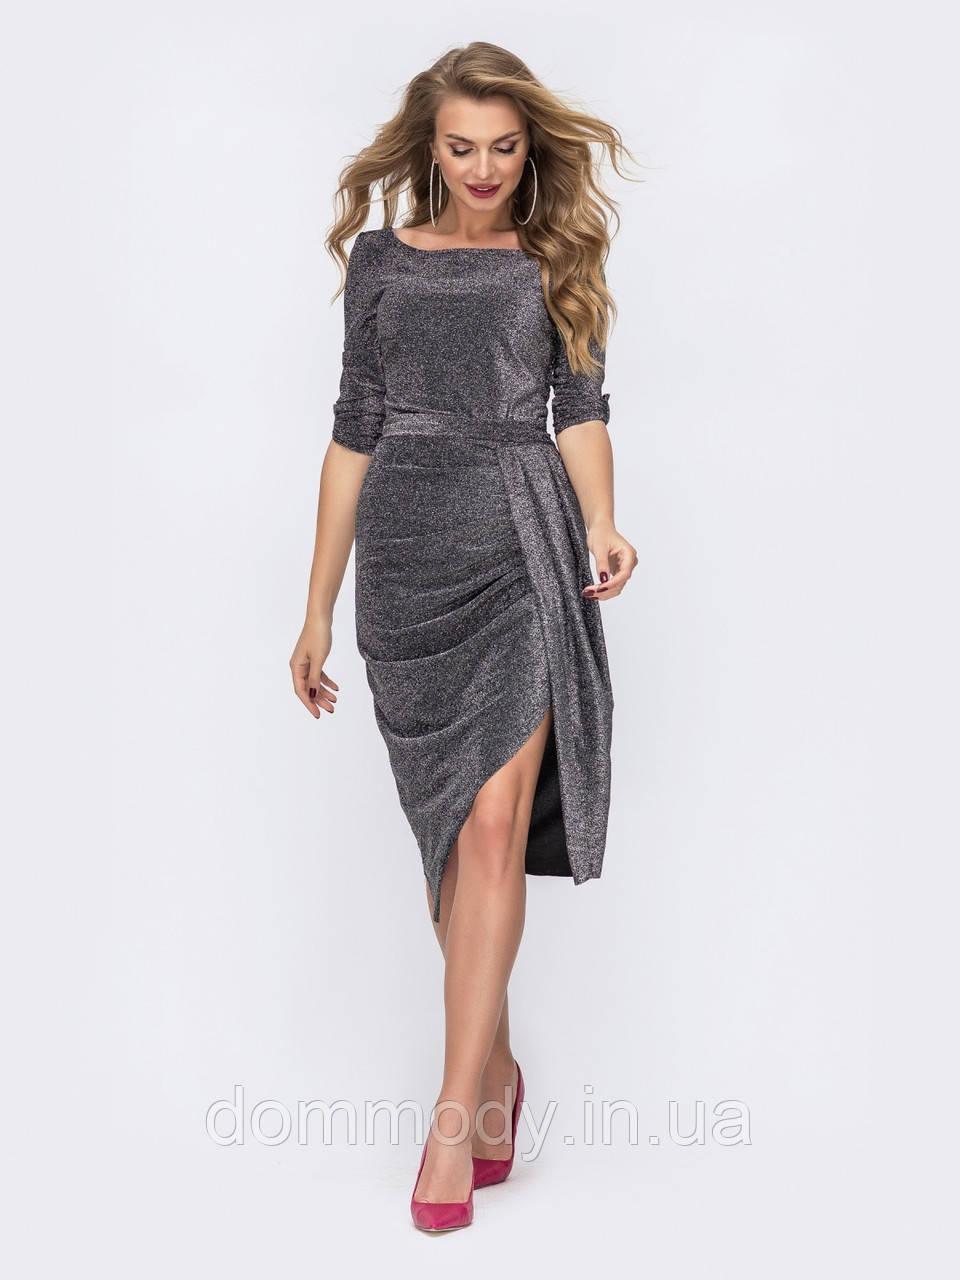 Платье женское  Festive gray